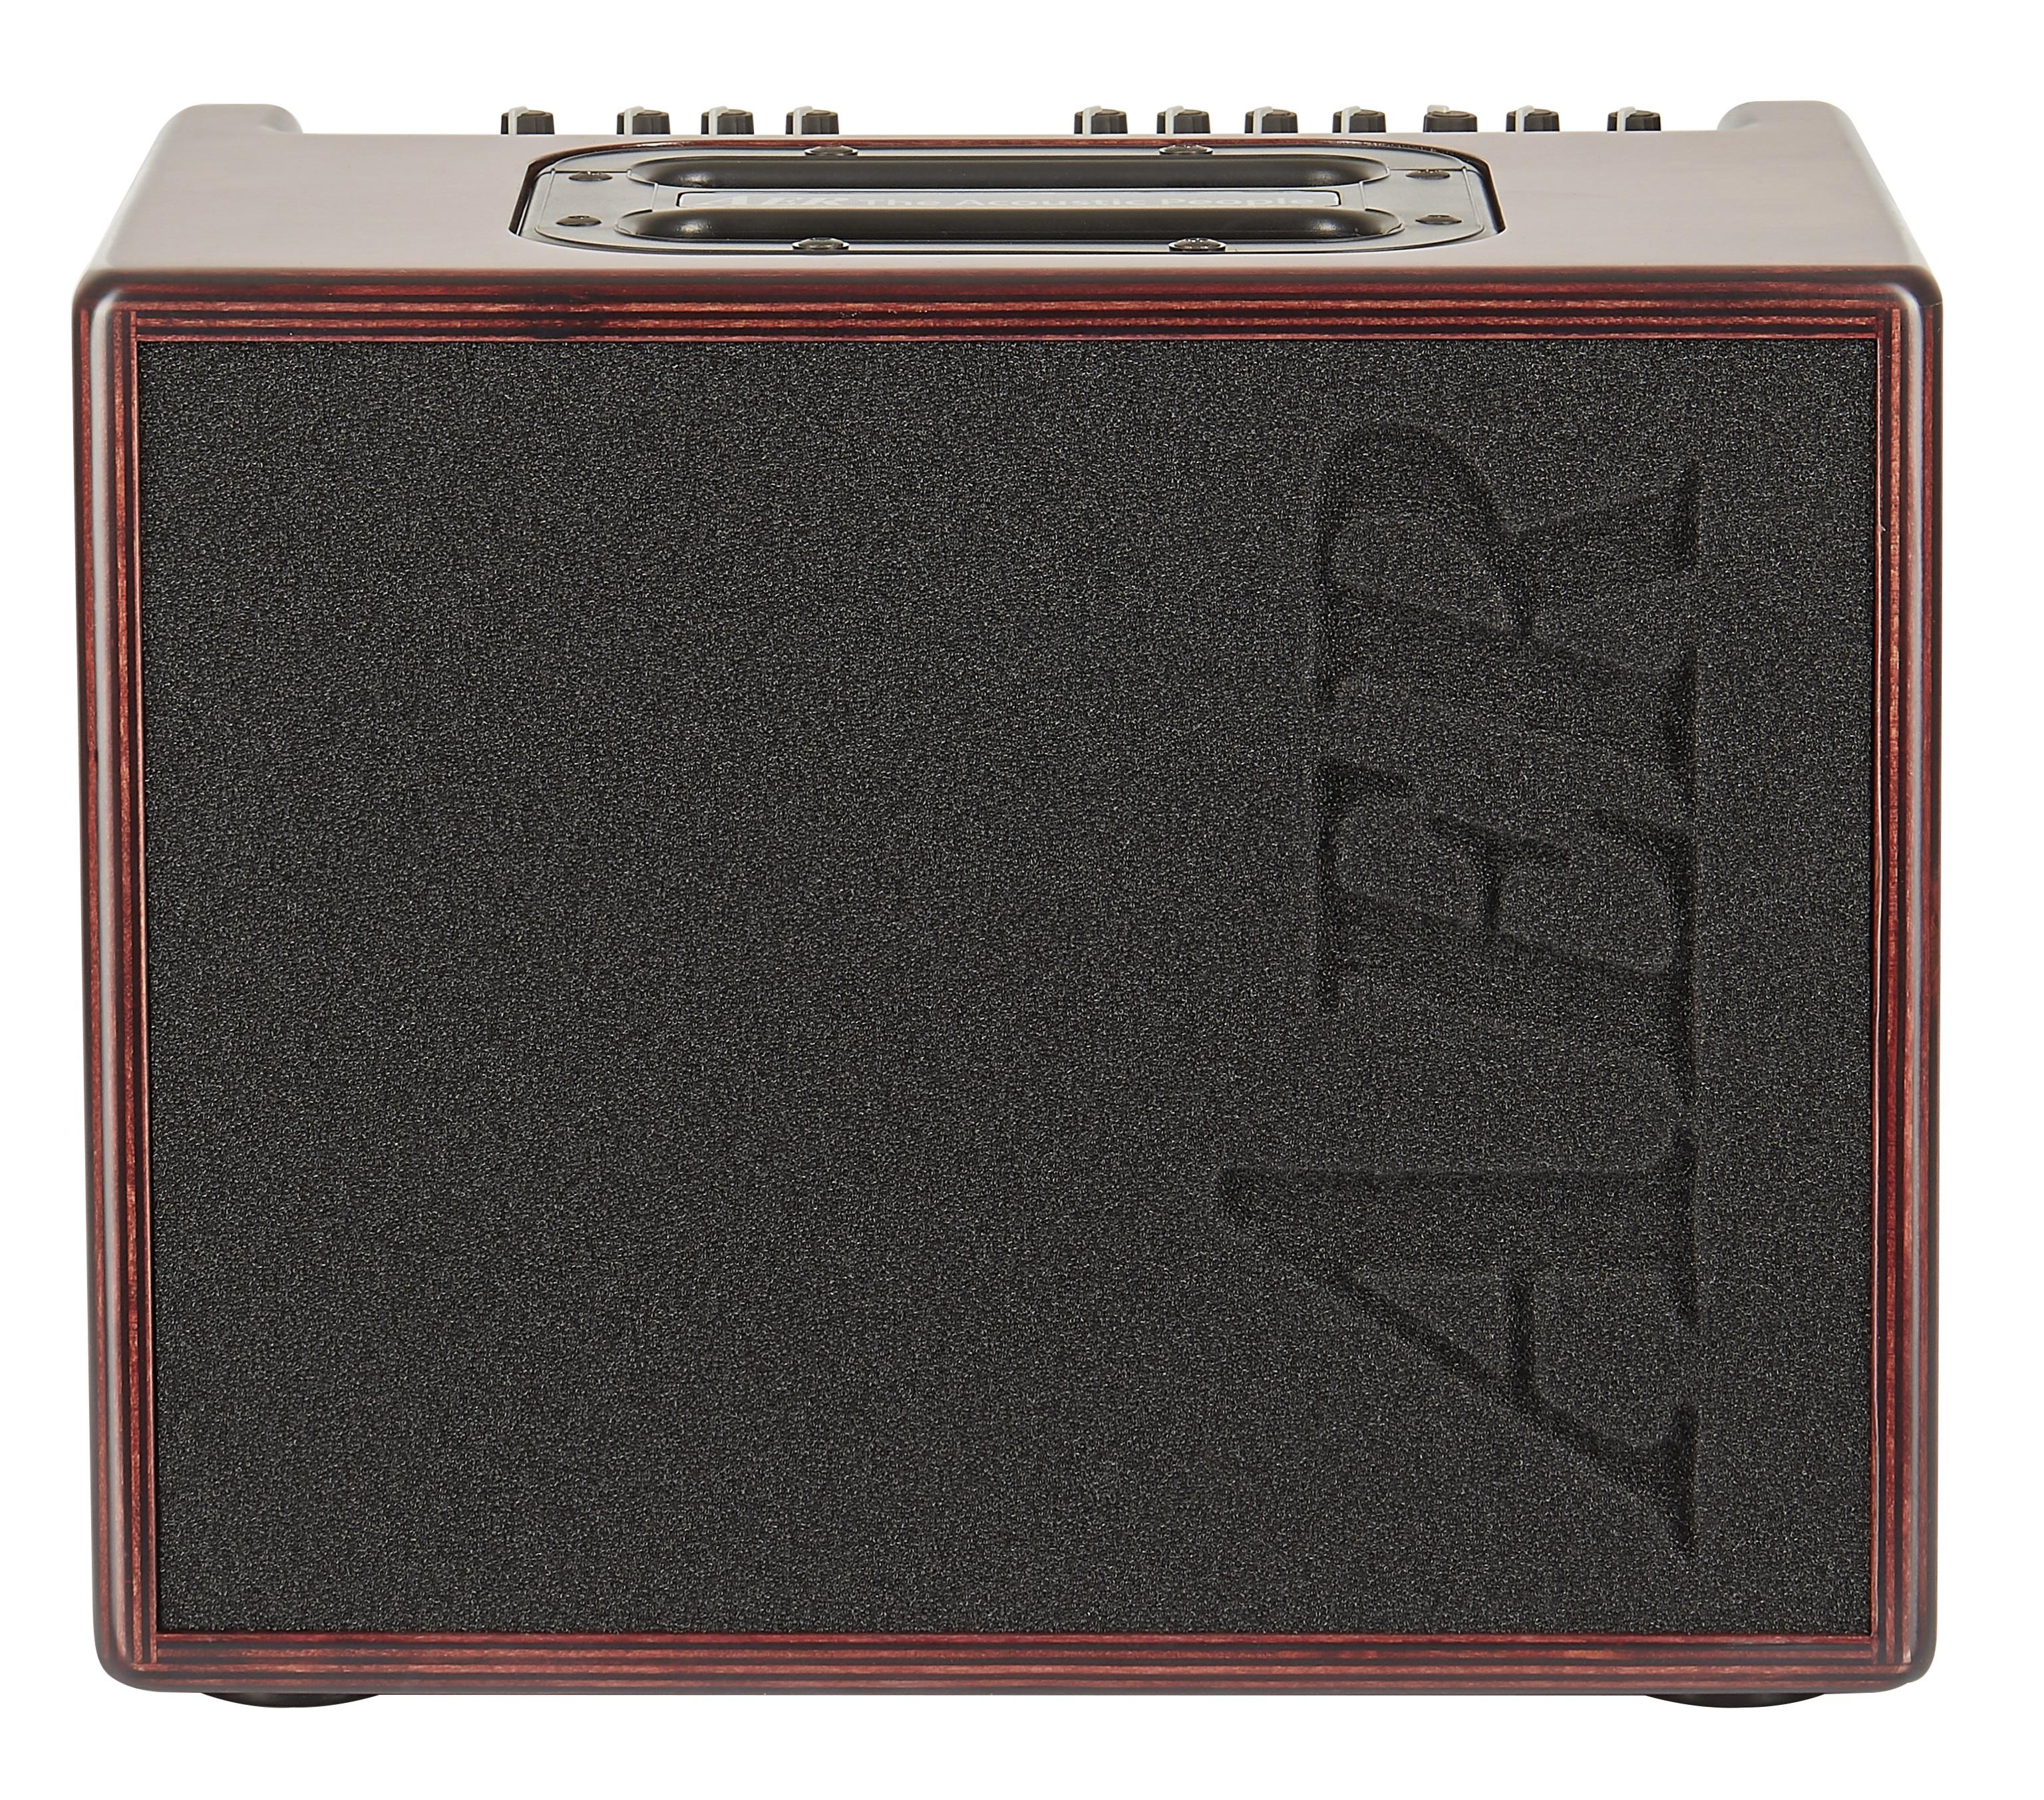 Aer Compact 60 IV PMH